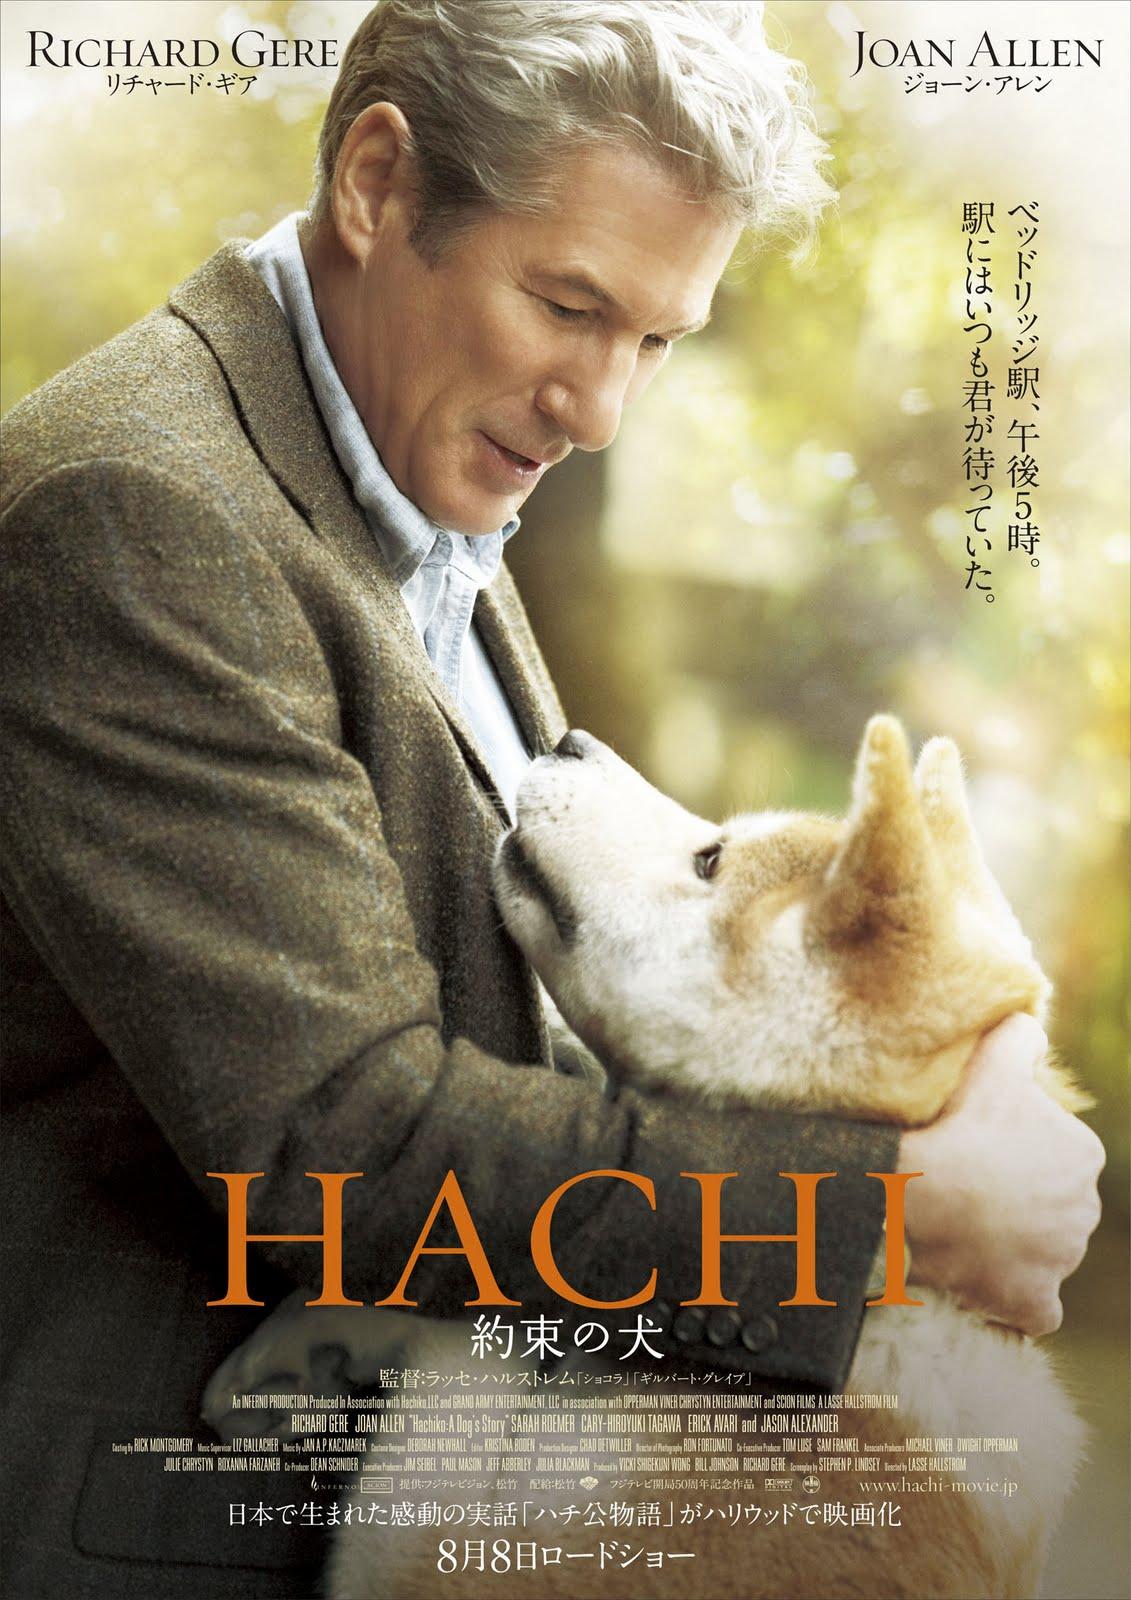 Sunshine on Sugar Hill: Movie: Hachiko, A Dog's Tale